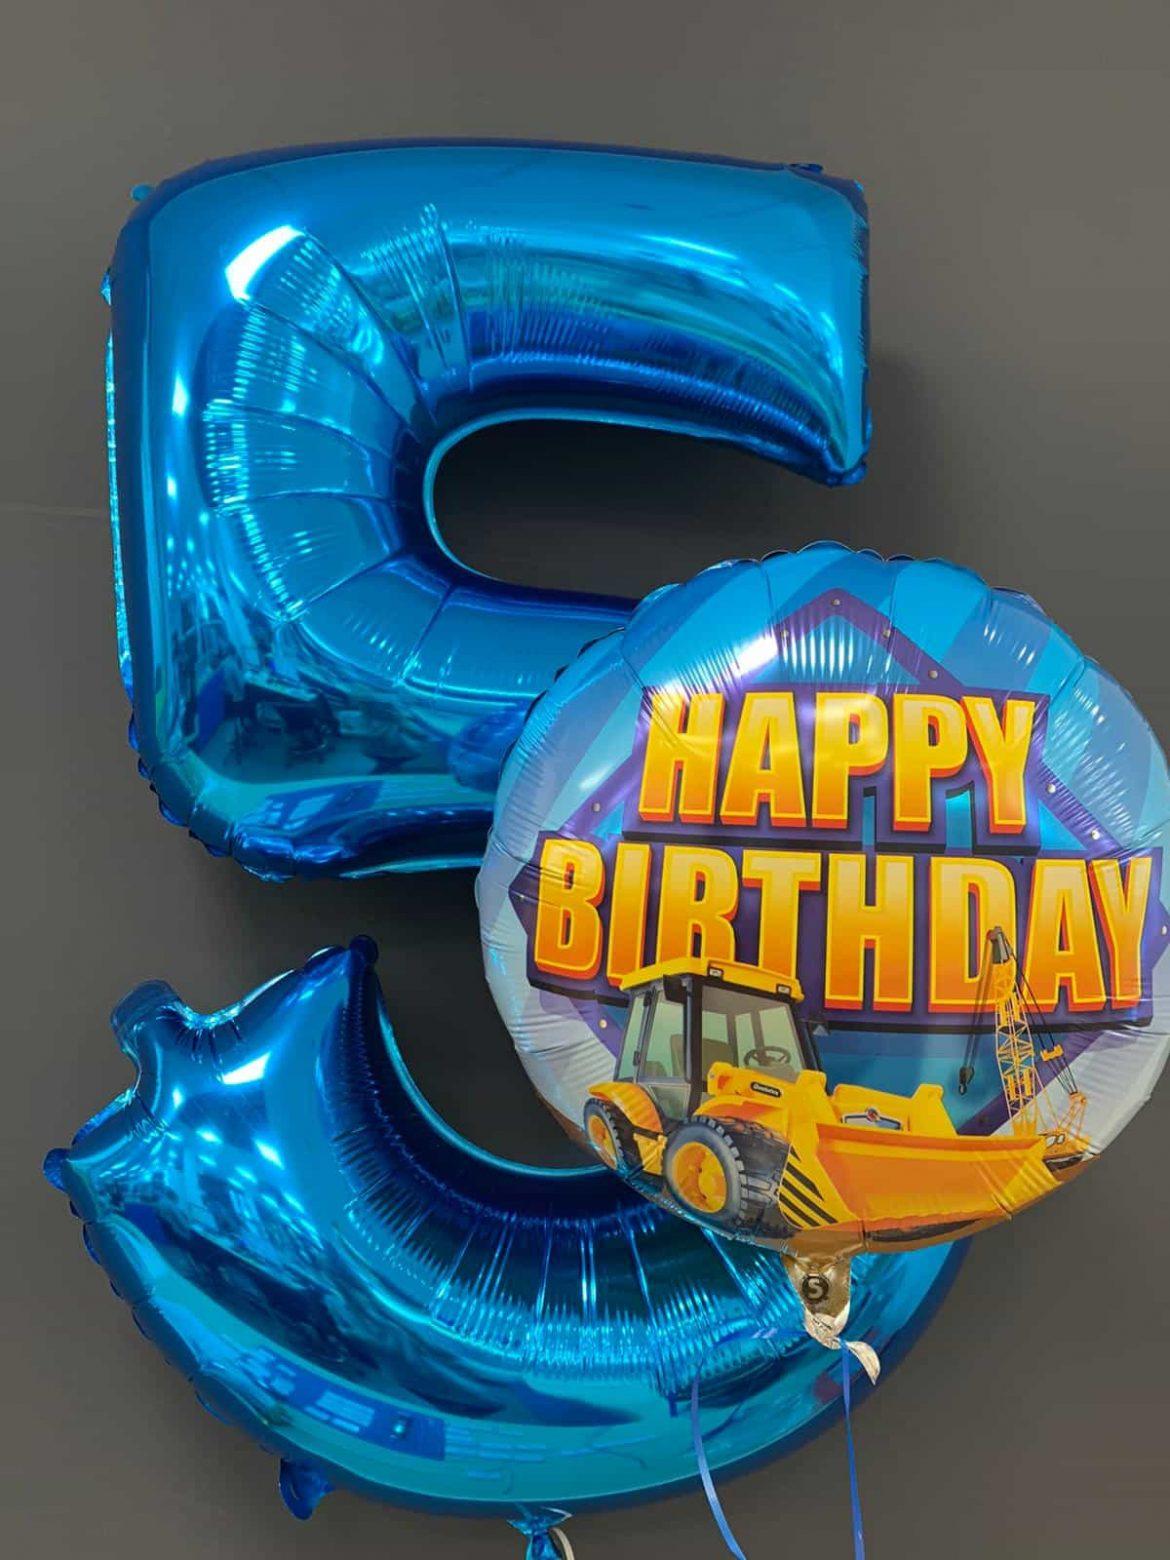 Happy Birthday € 5,50 <br> Zahlenballon € 9,90 1